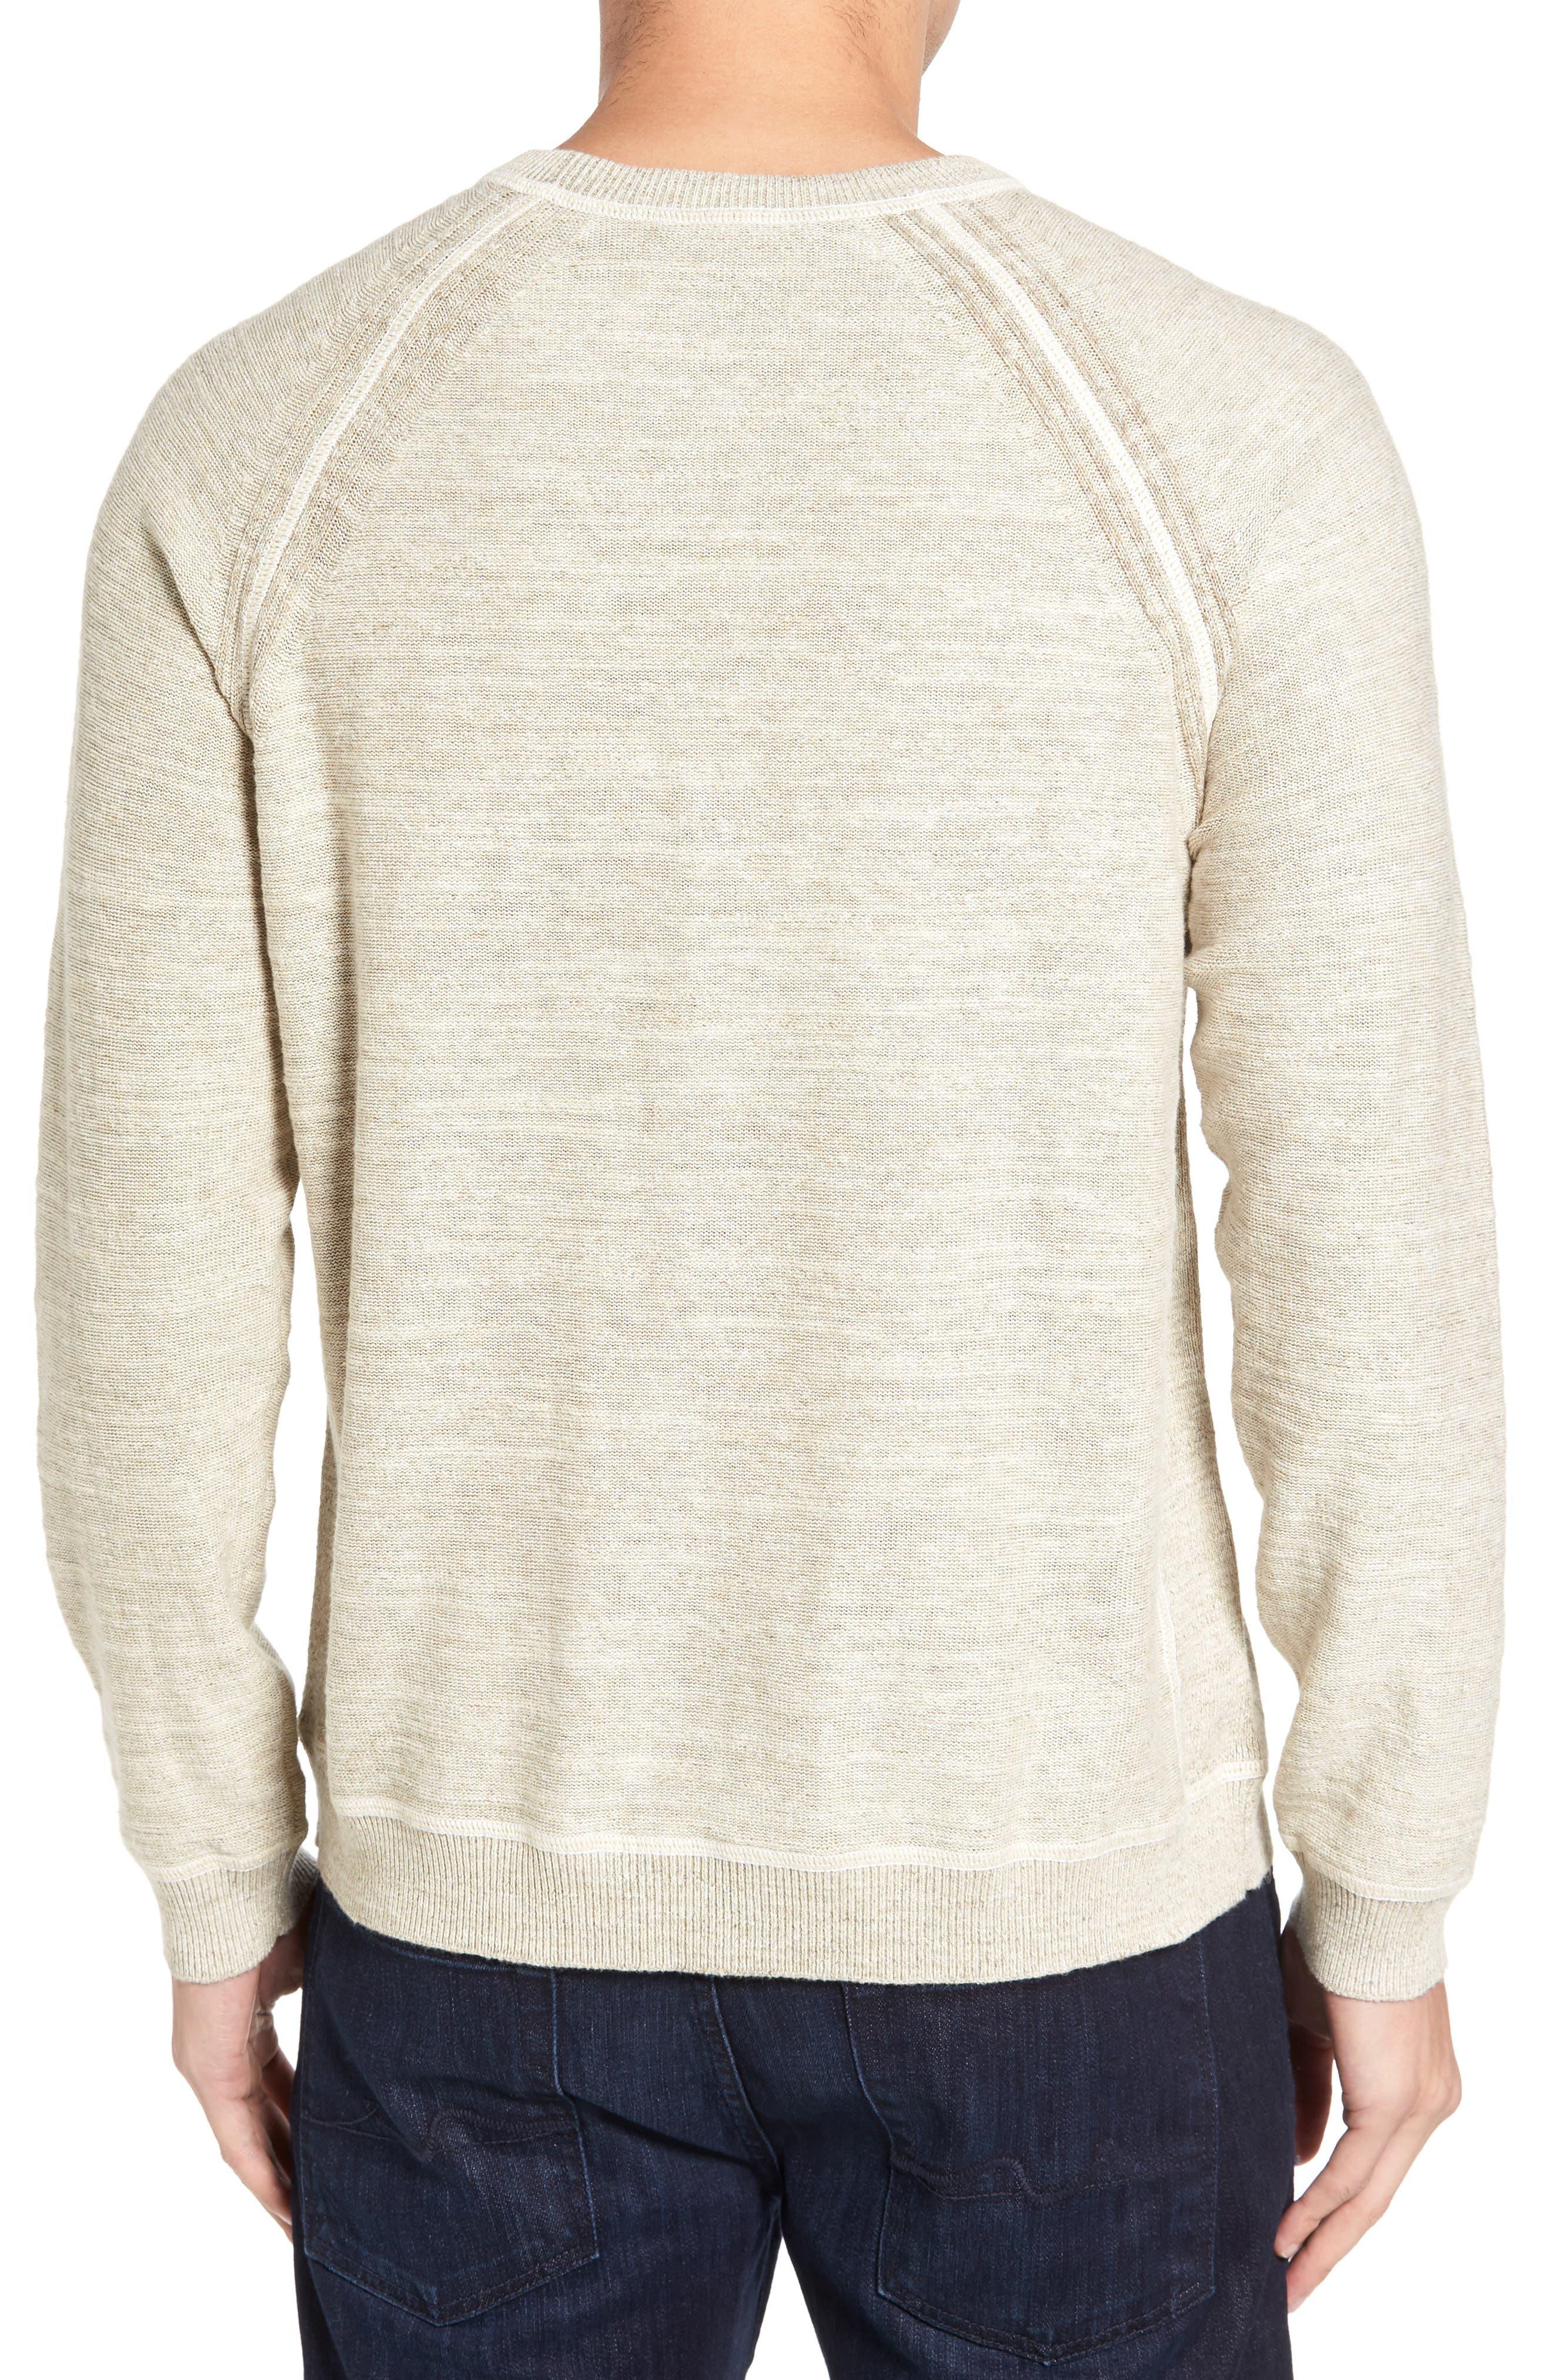 Alternate Image 2  - Tommy Bahama Sandy Bay Reversible Crewneck Sweater